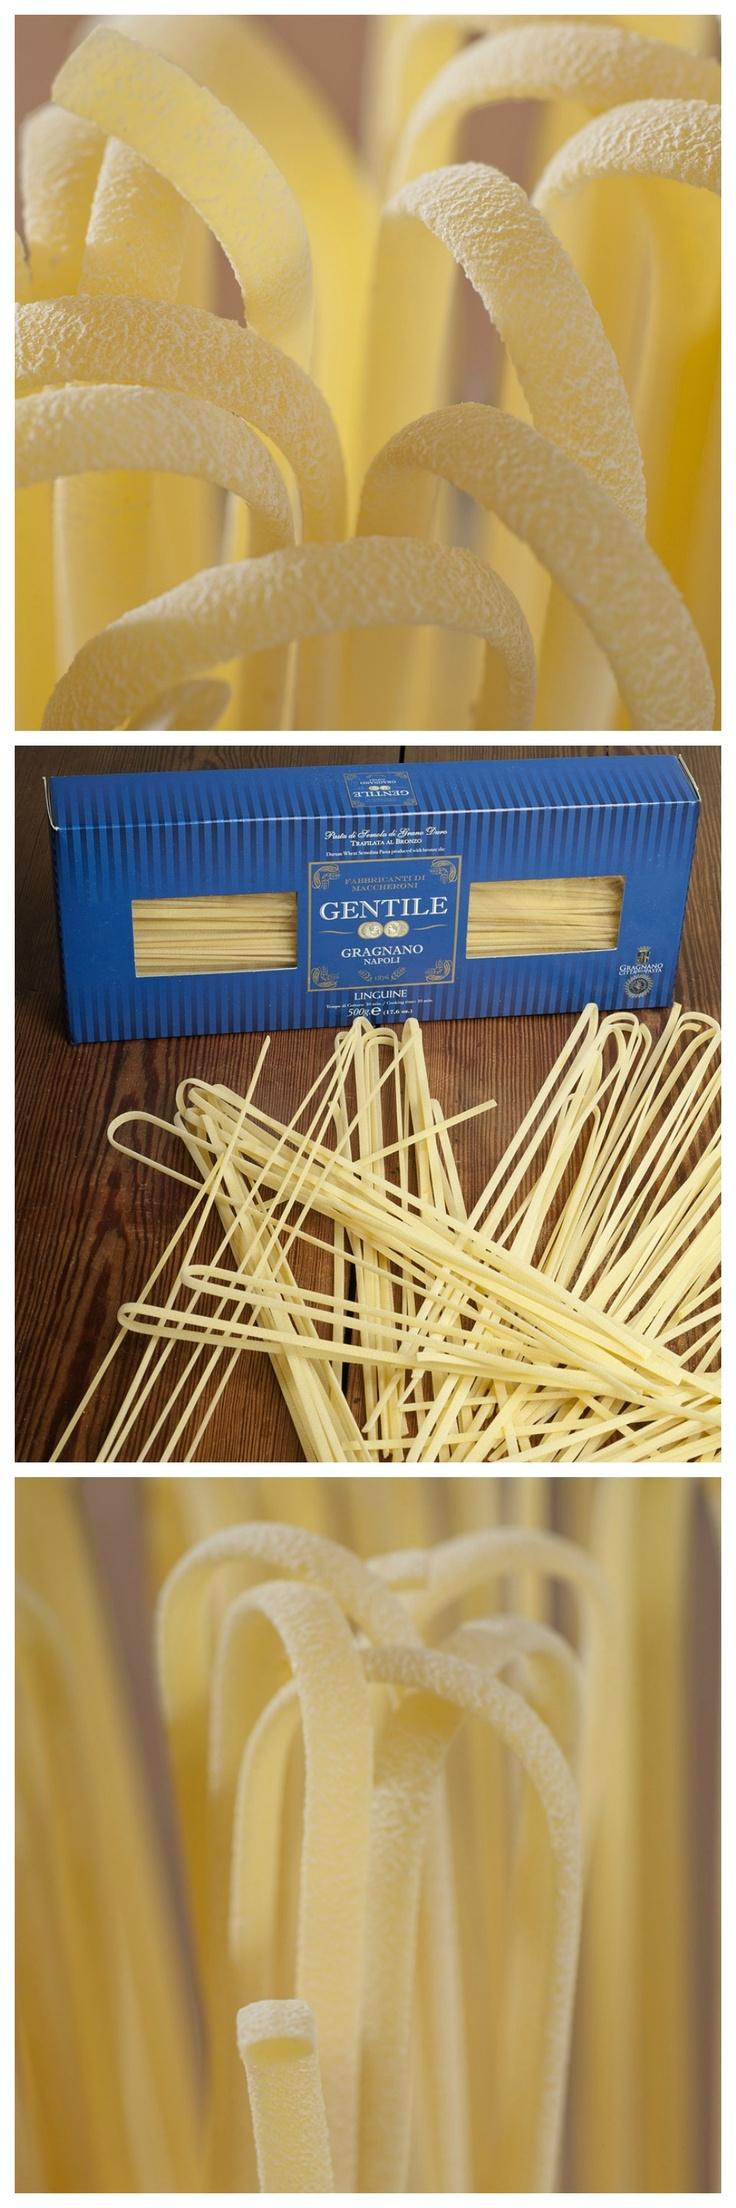 "#Linguine born ""al dente"" - #Pasta #Gentile #Gragnano"